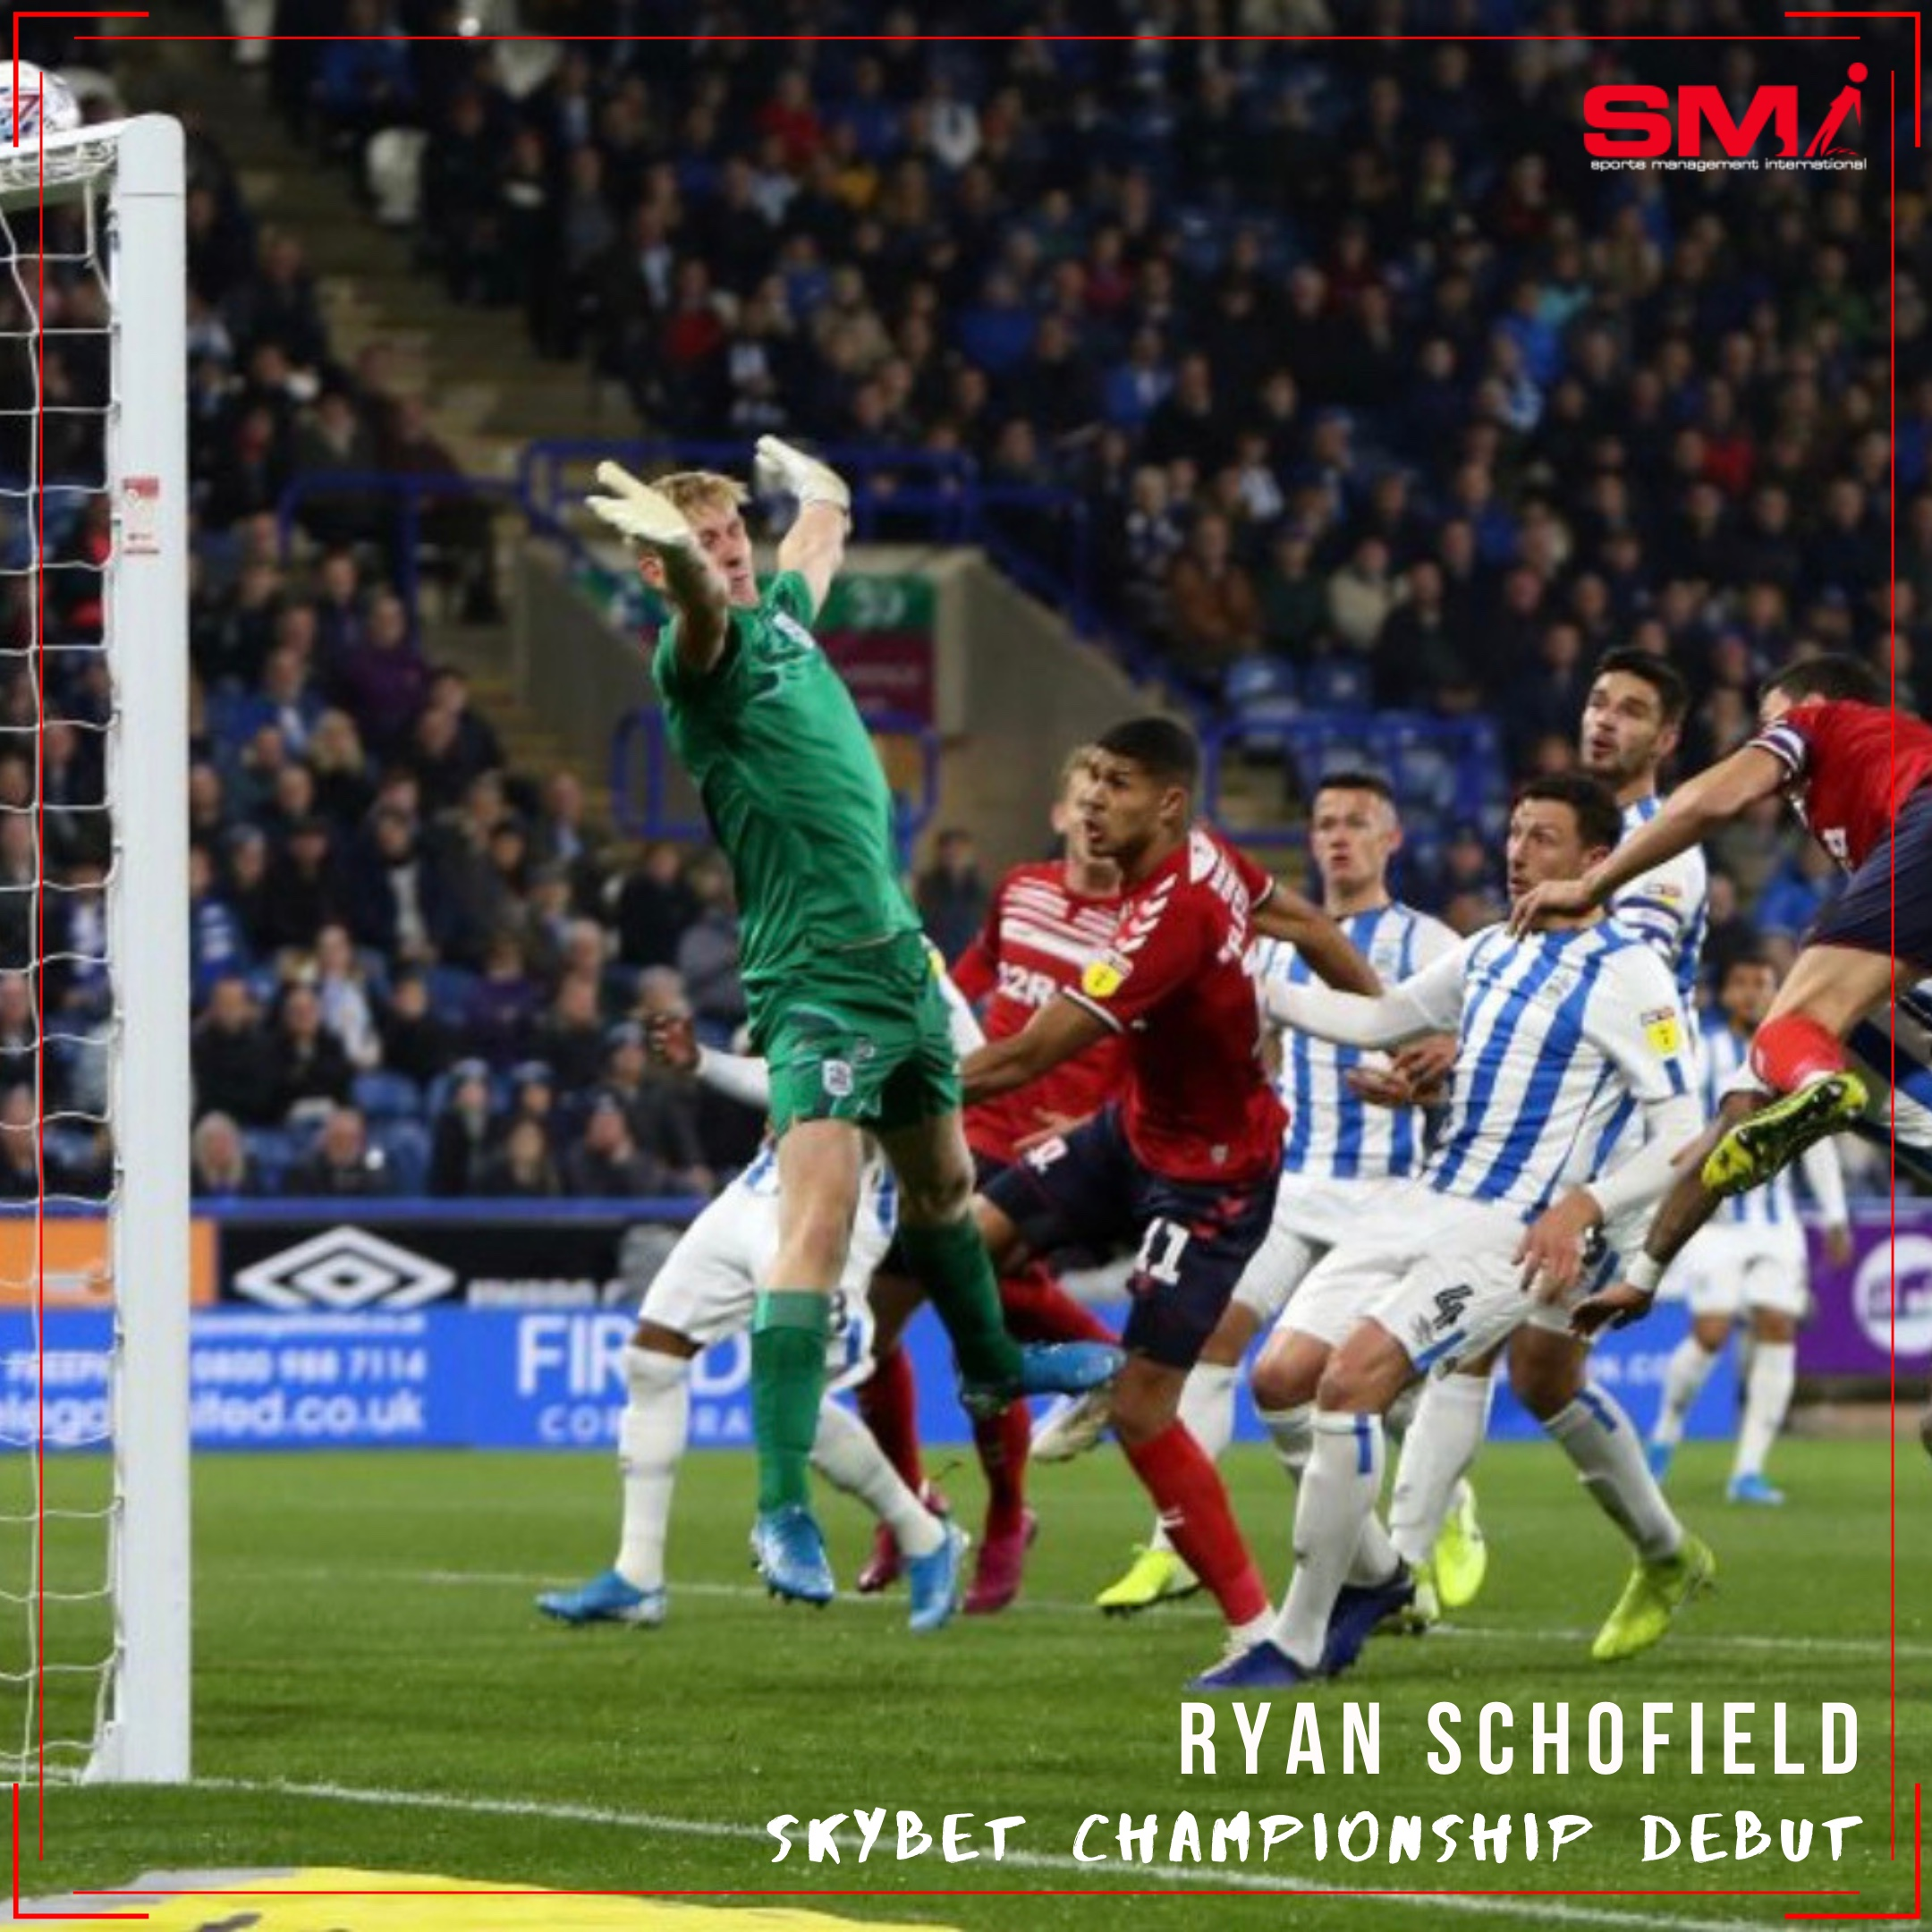 Ryan Schofield makes Championship debut